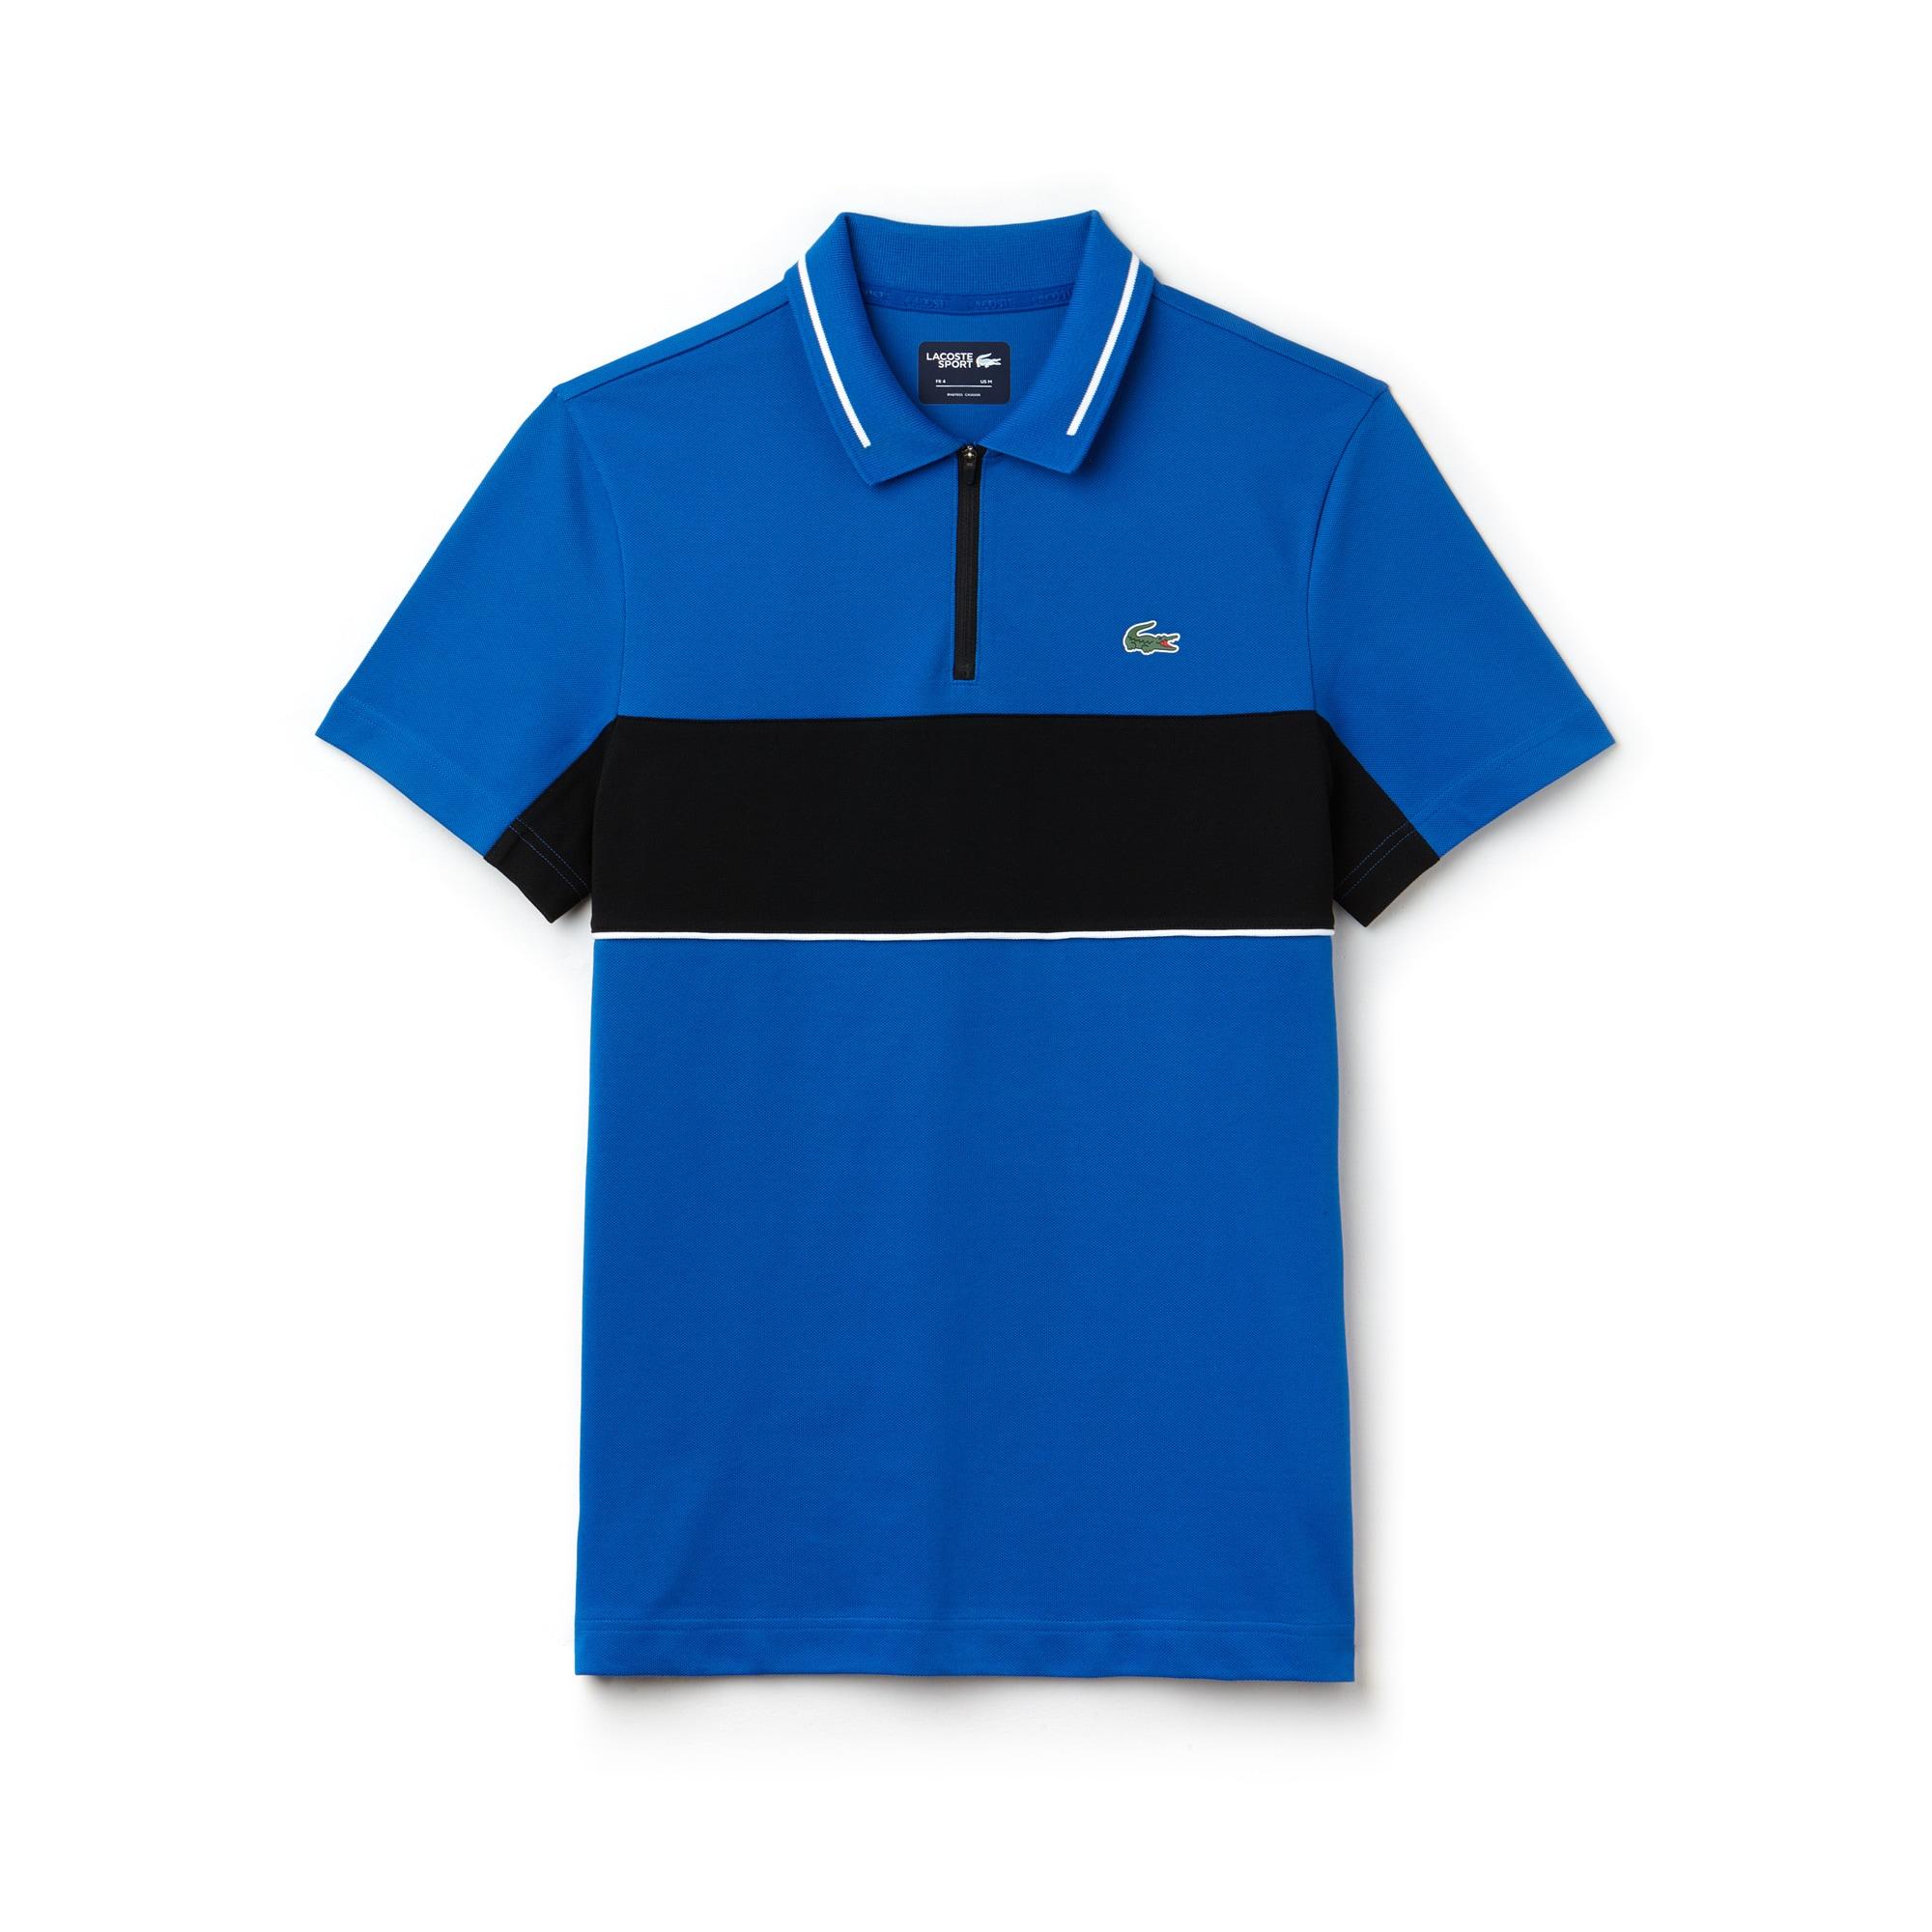 Lacoste - Herren LACOSTE SPORT Tennis-Poloshirt aus Funktionspiqué - 4